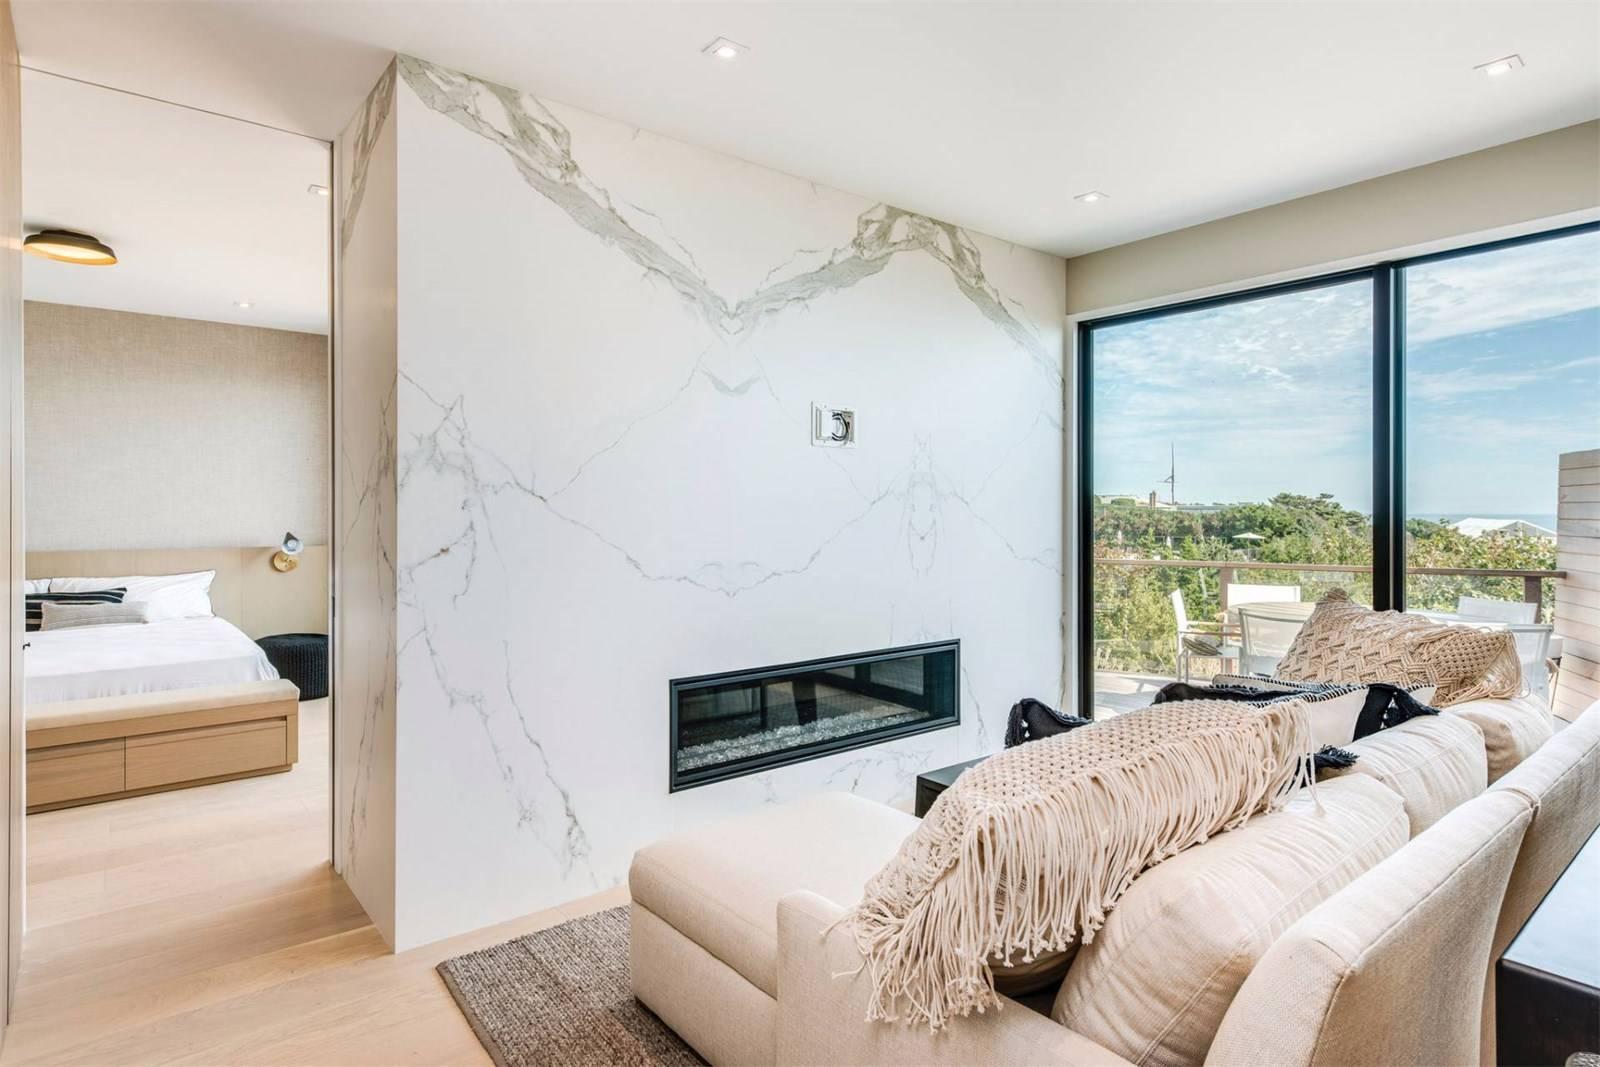 Ремонт квартиры по дизайн-проекту под ключ